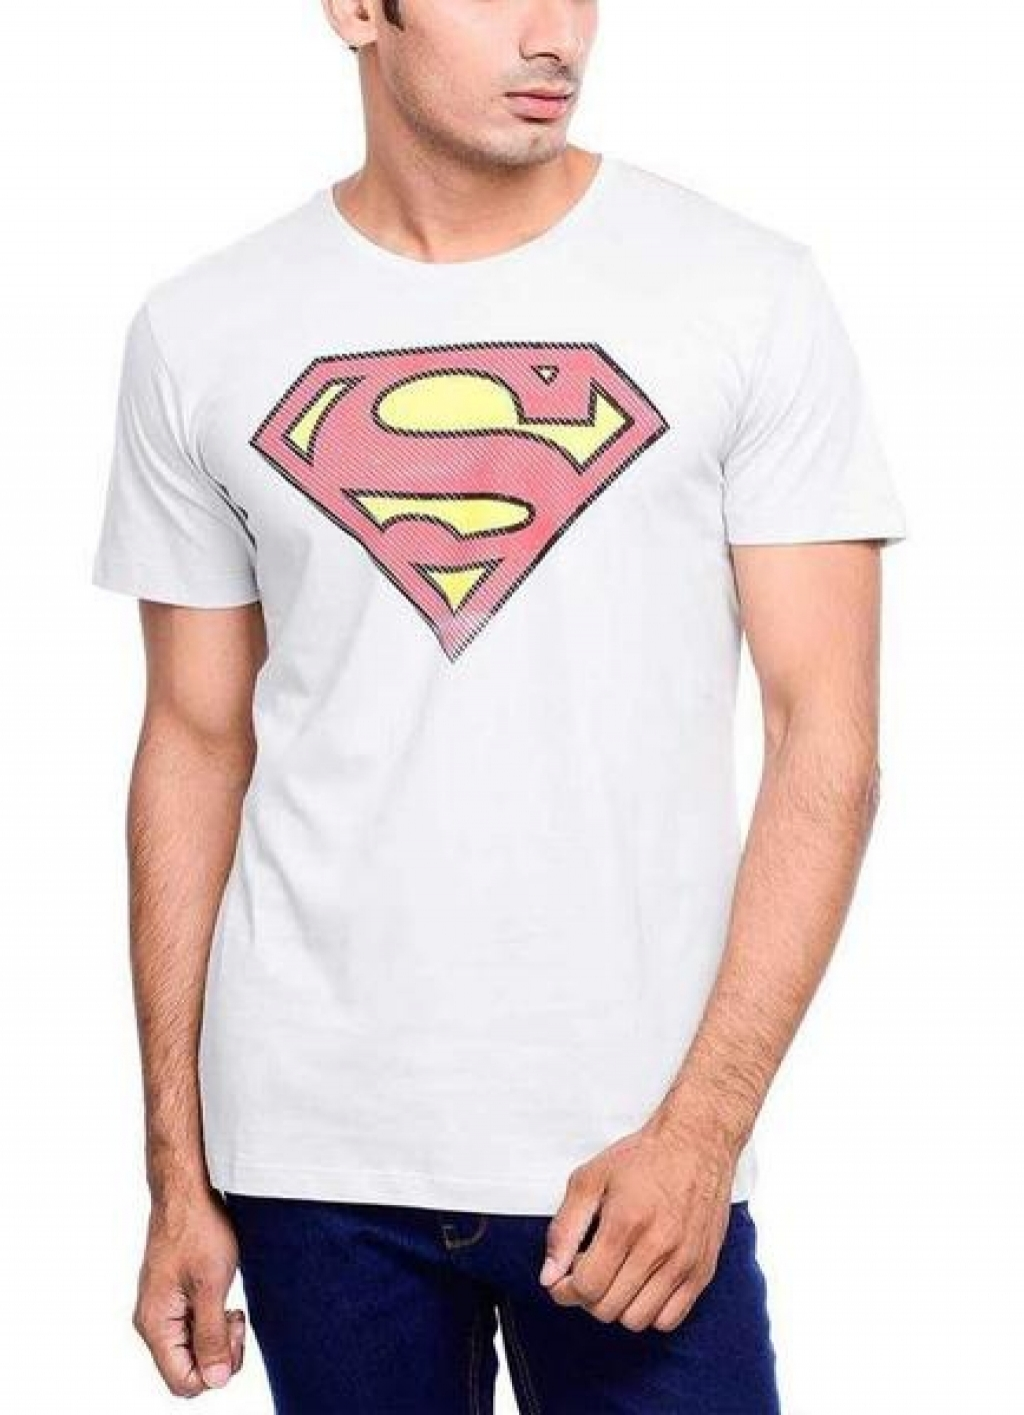 14993351170_Affordable_Superman_Power_Up_Grey_Half_Sleeve_Men_T-Shirt.jpg